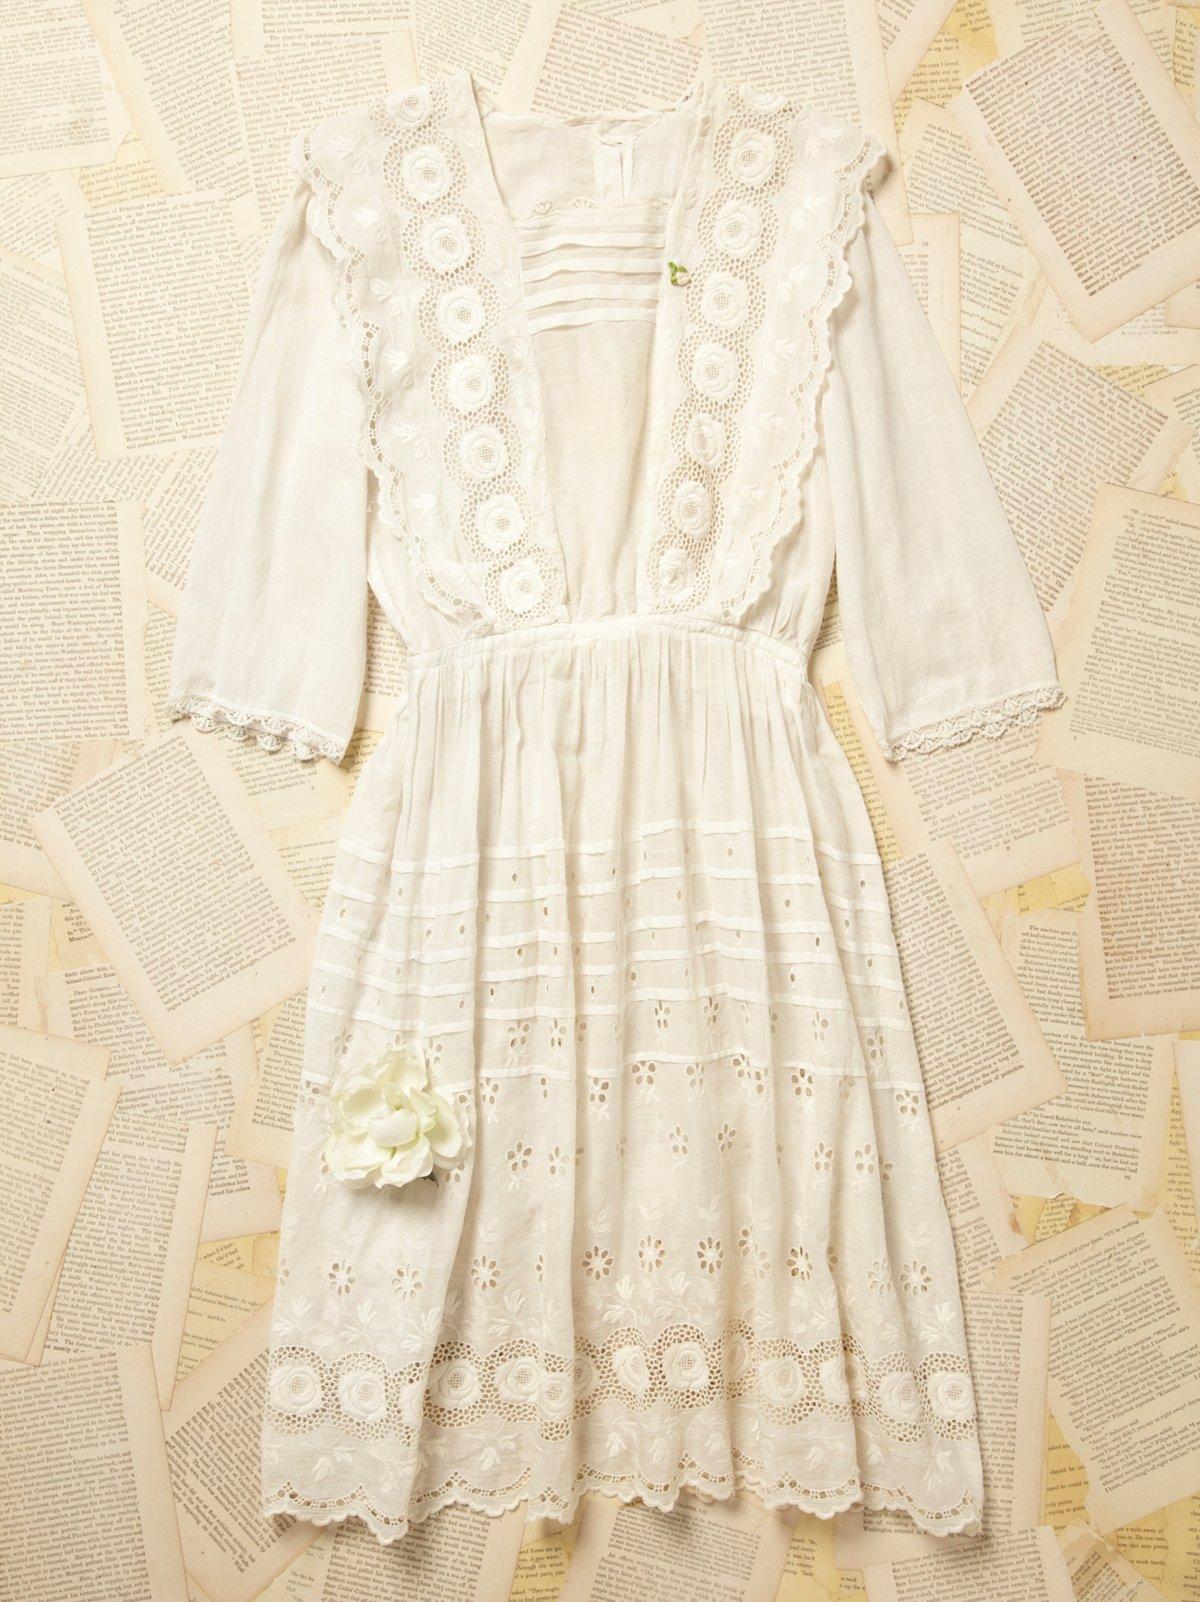 Vintage Victorian Lace and Cotton Dress